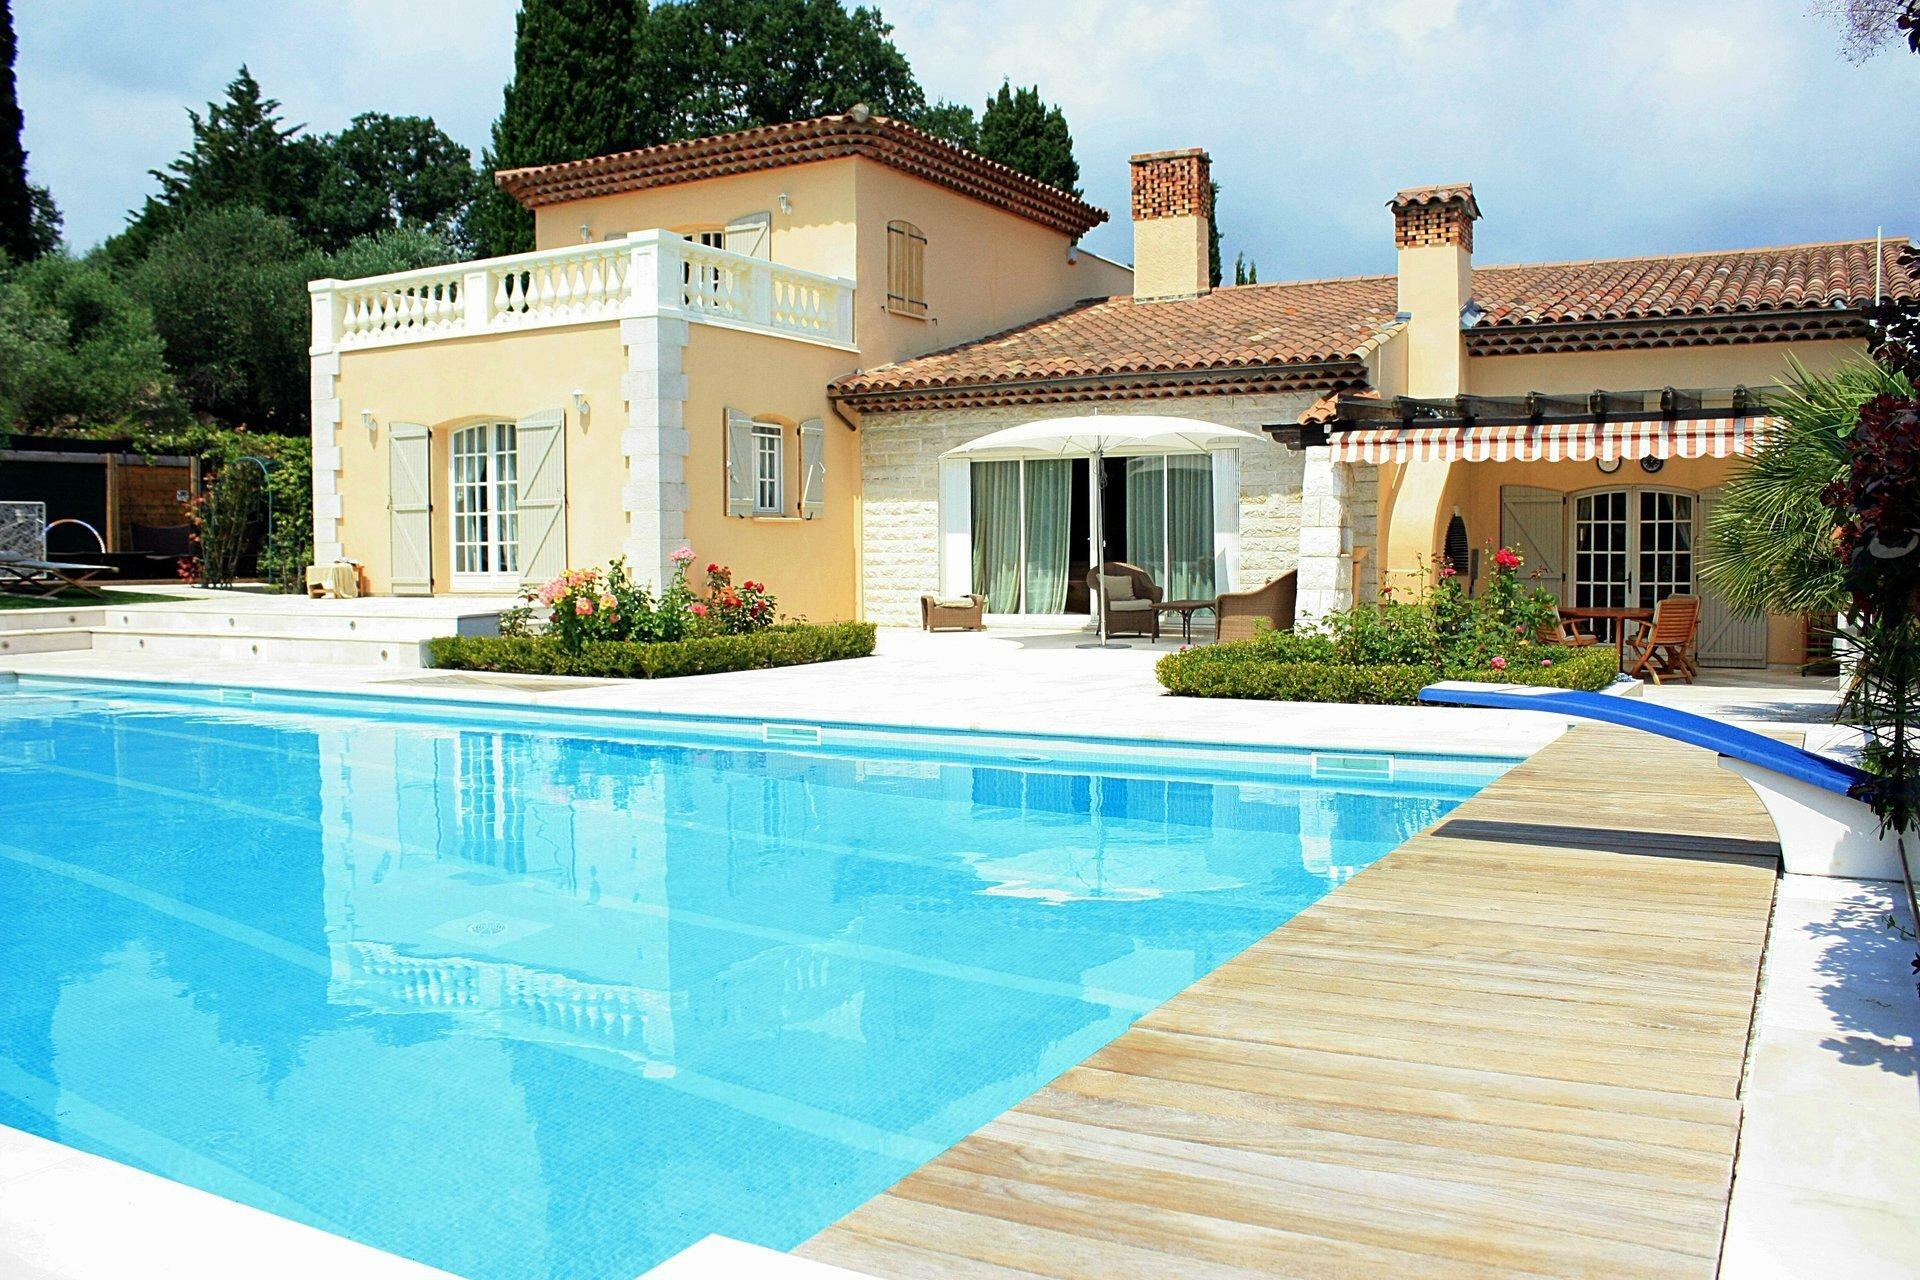 Villa in Biot, Provence-Alpes-Côte d'Azur, France 1 - 11075448